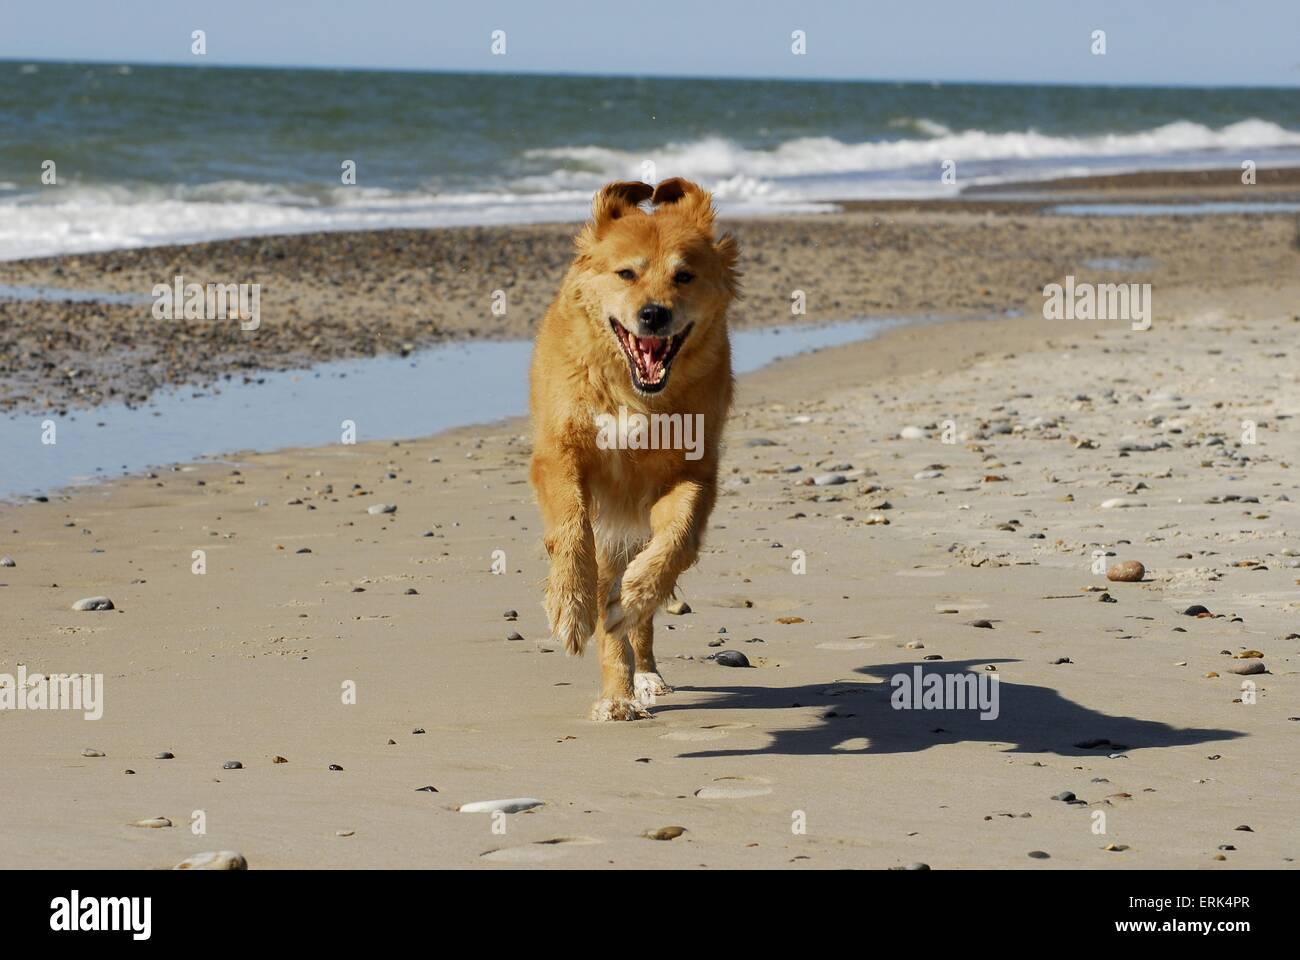 dog at the beach - Stock Image